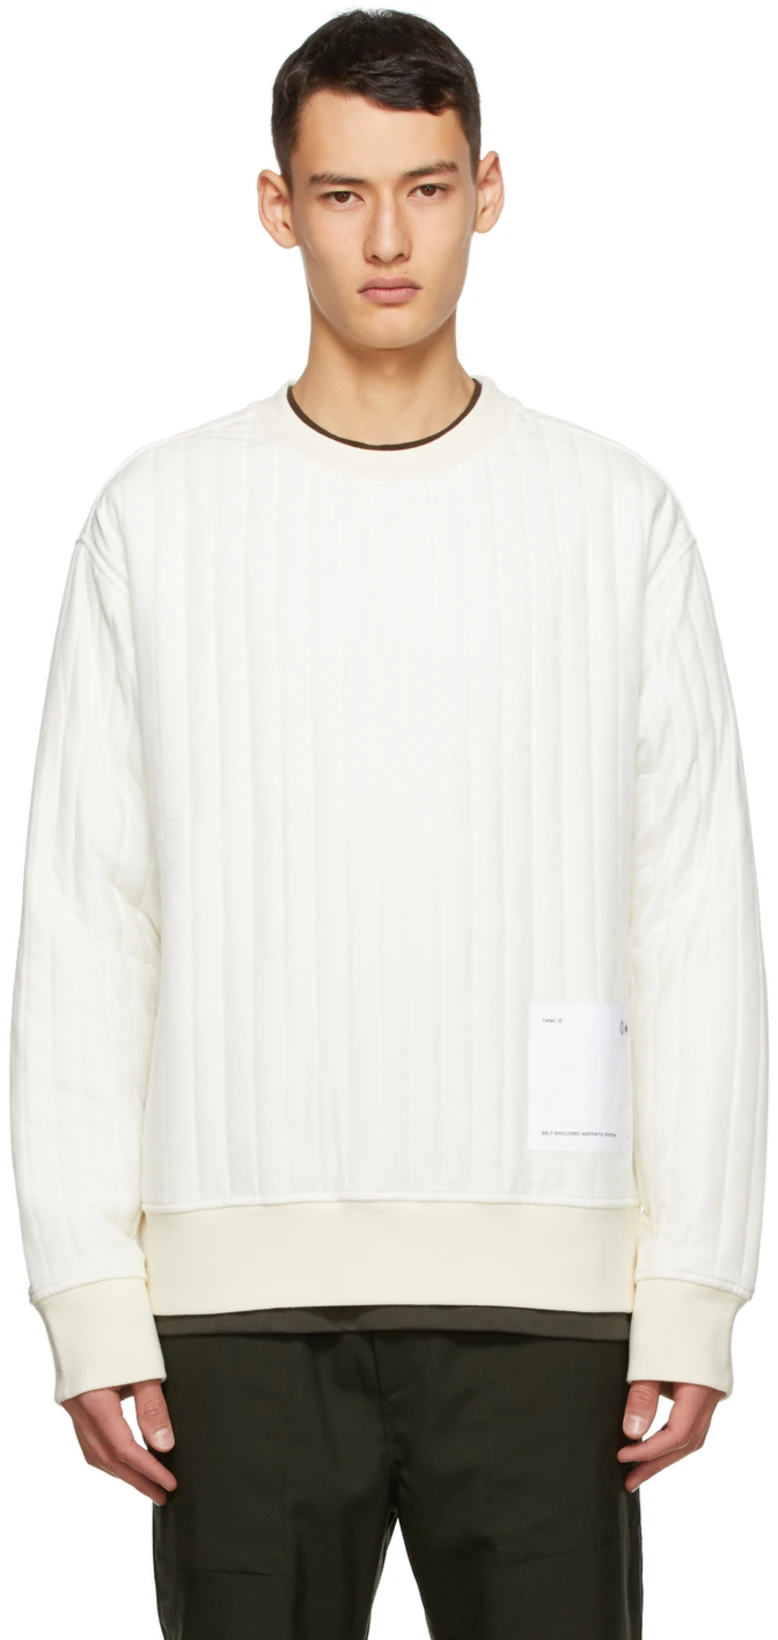 Oamc For Men Ss21 Collection Oamc Black Adidas Sweatshirts [ 1640 x 778 Pixel ]